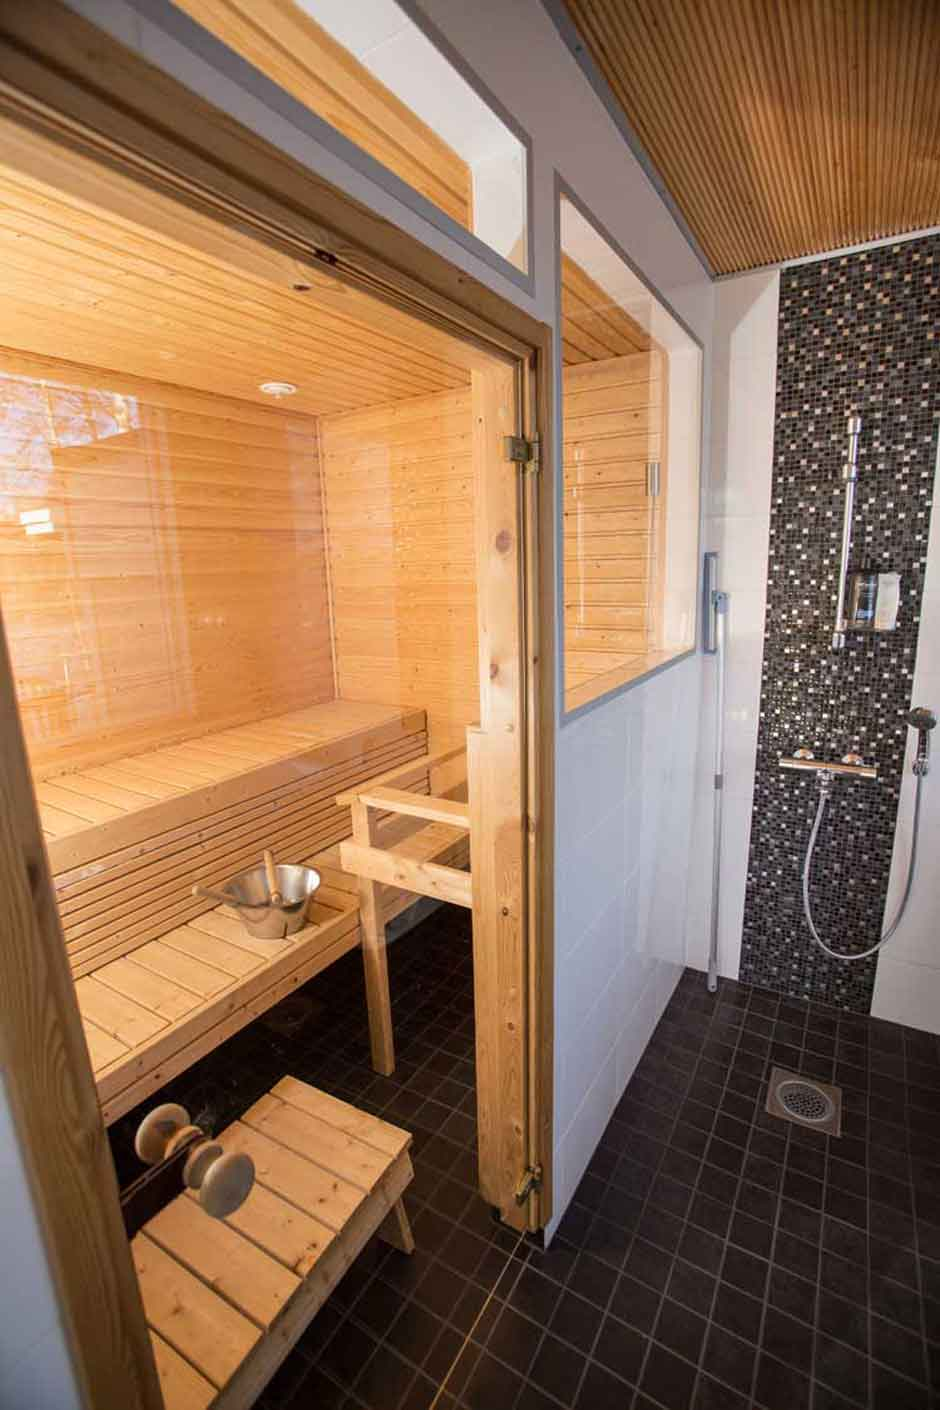 galeria-sauna-villa-takila-alquiler-cabana-finlandia-verano-2017